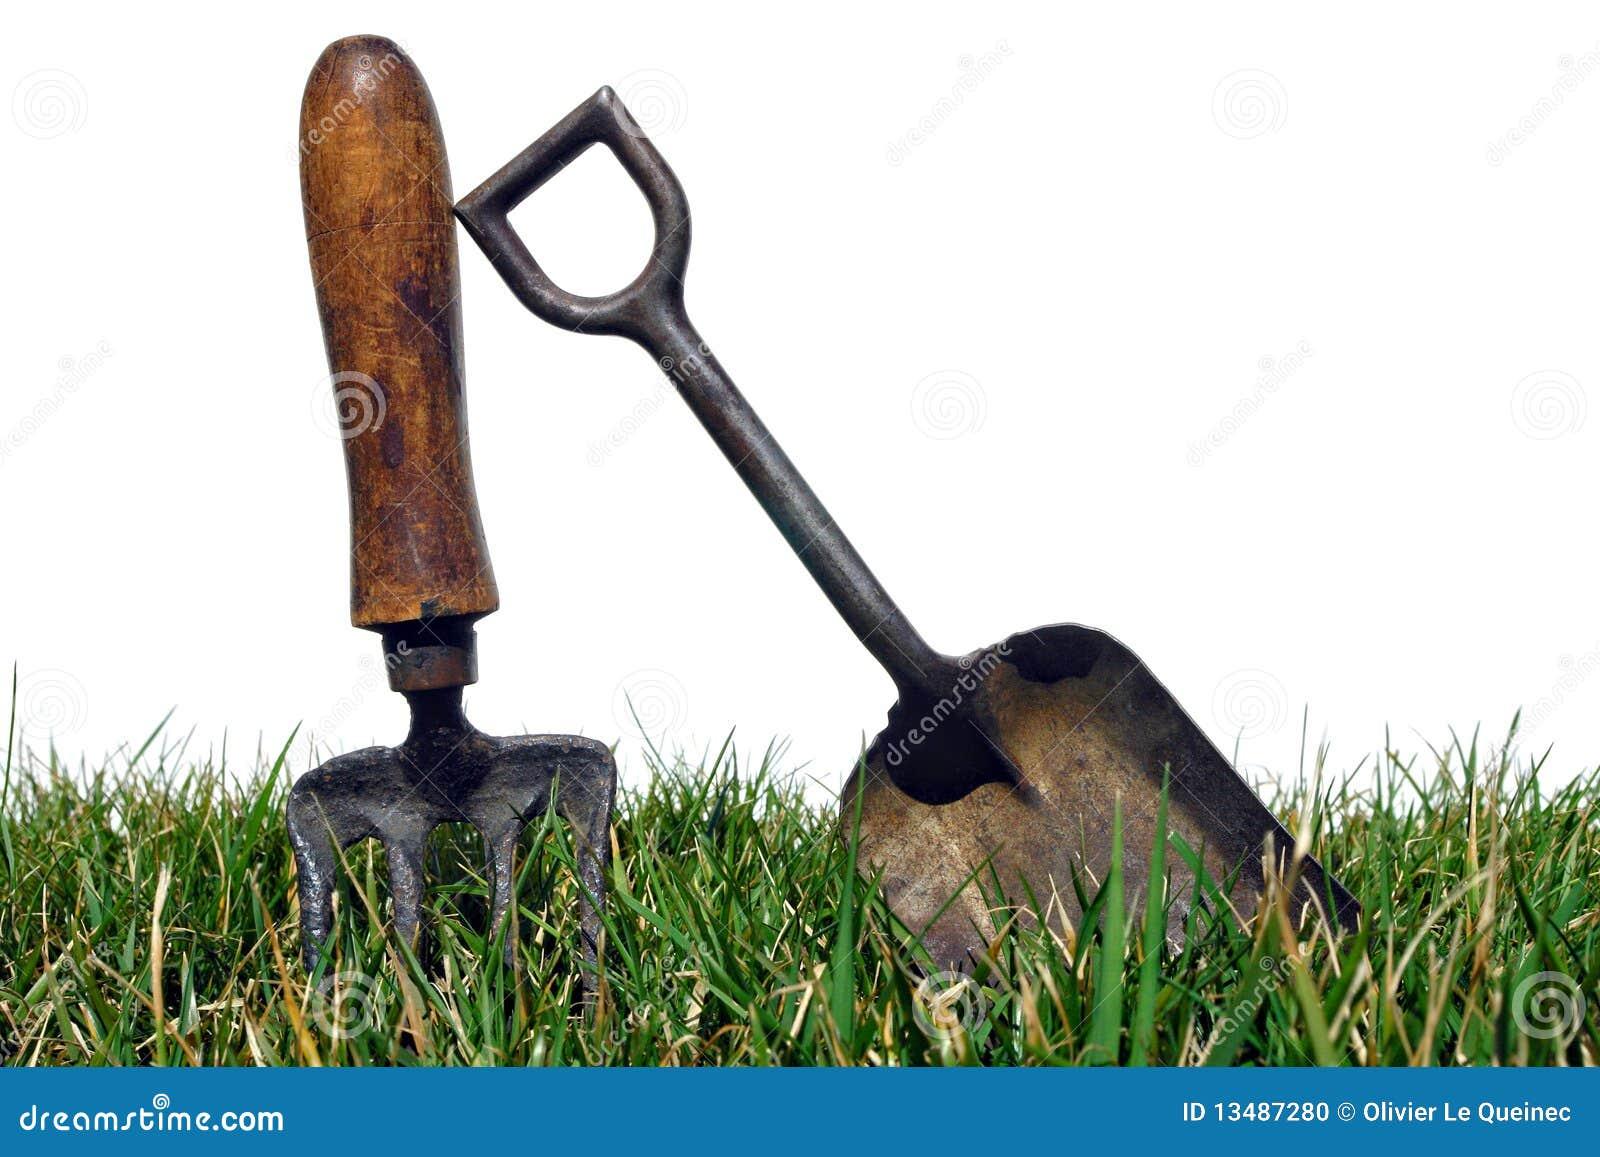 Charmant Antique Gardening Tools In Garden Grass On White